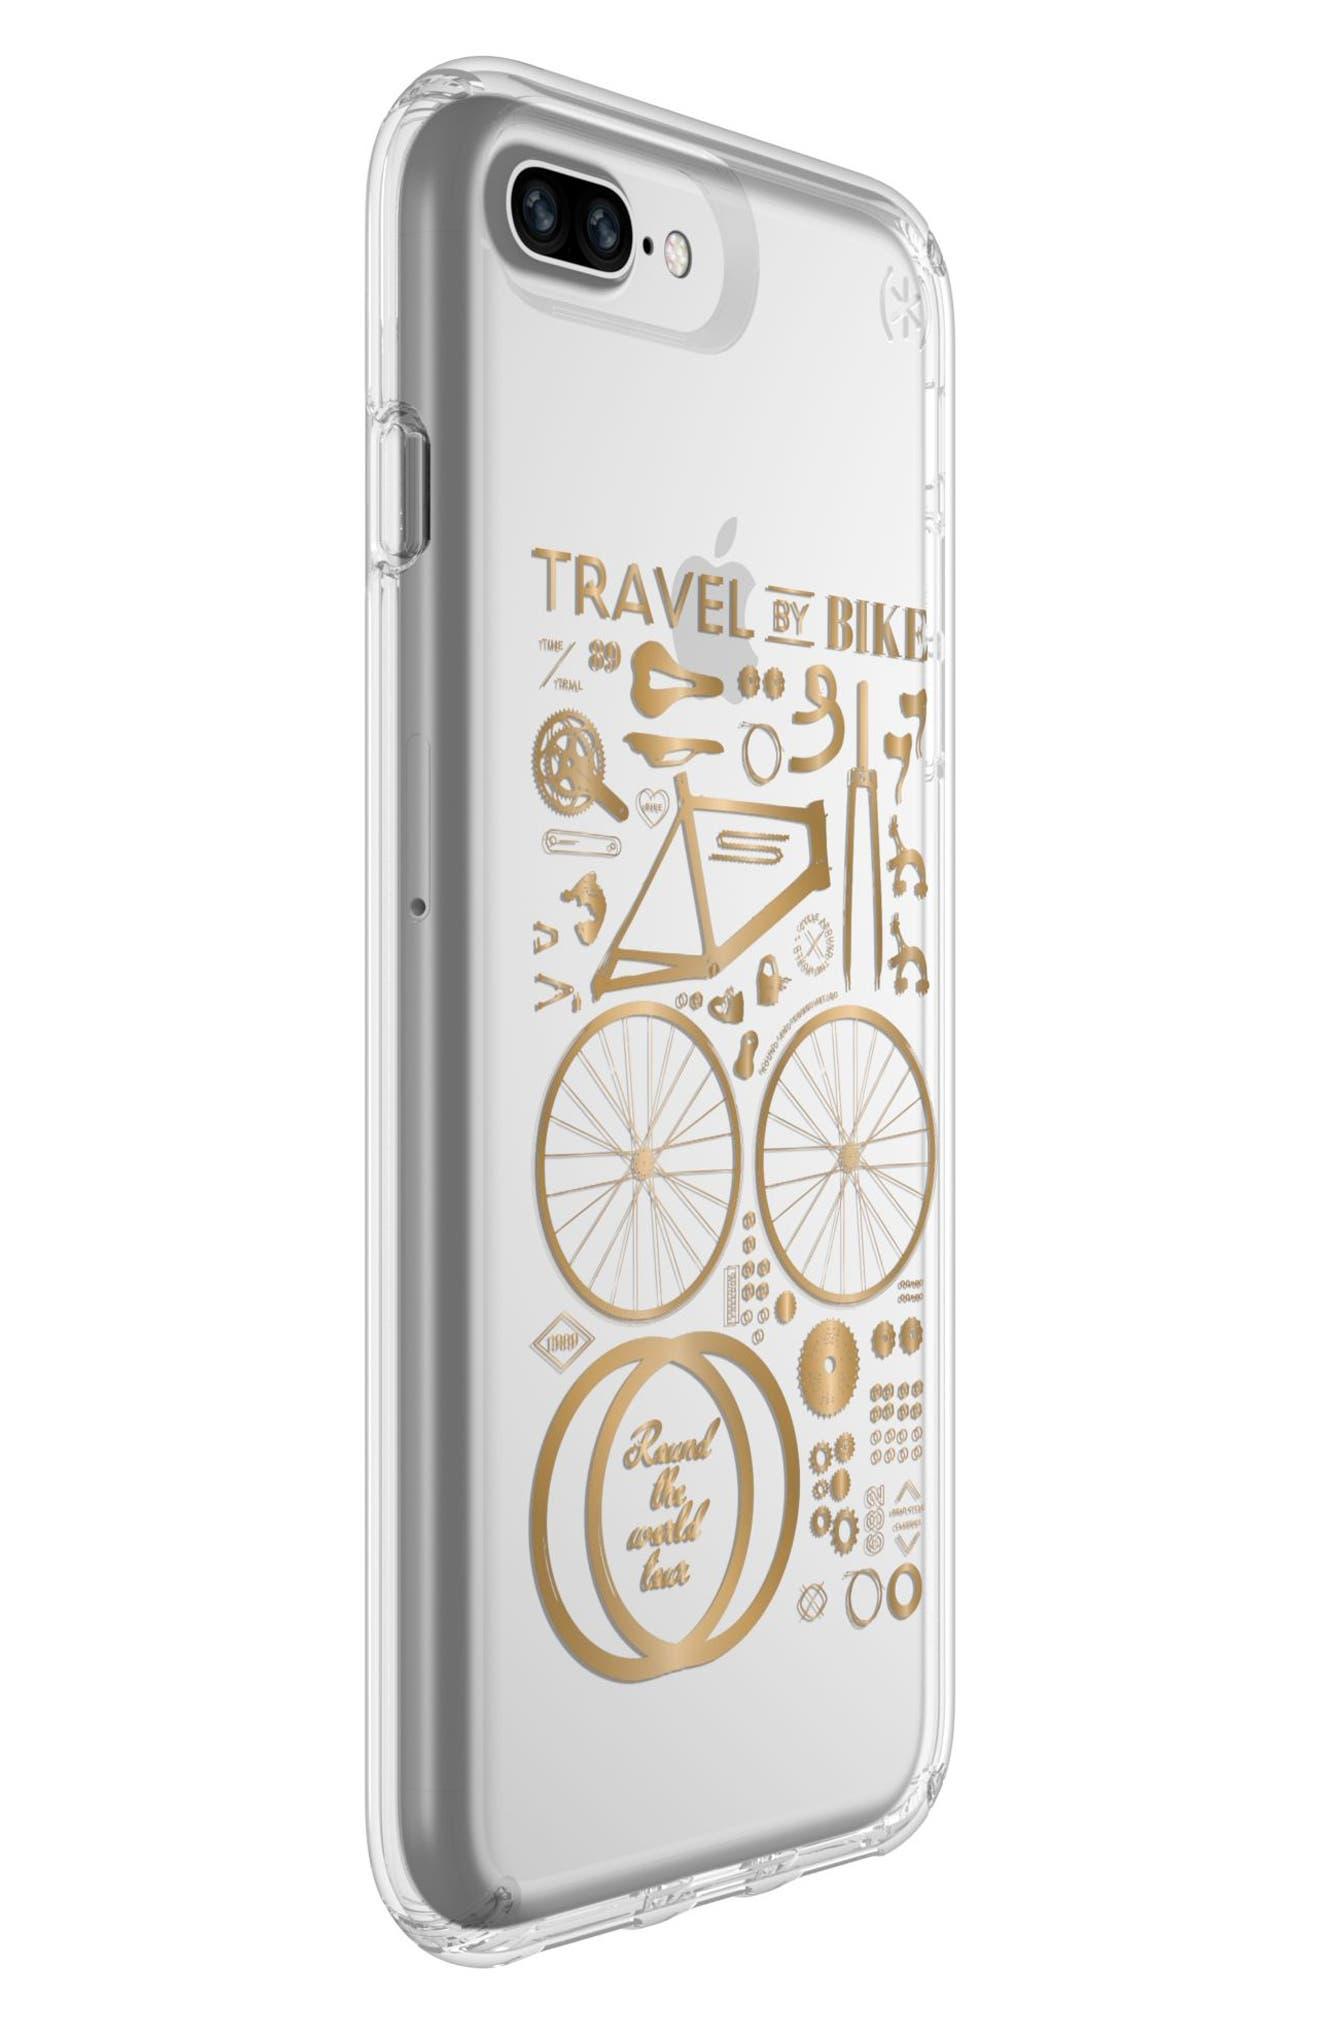 iPhone 6 Plus/6S Plus/7 Plus/8 Plus Case,                             Alternate thumbnail 2, color,                             Citybike Metallic Gold/ Clear